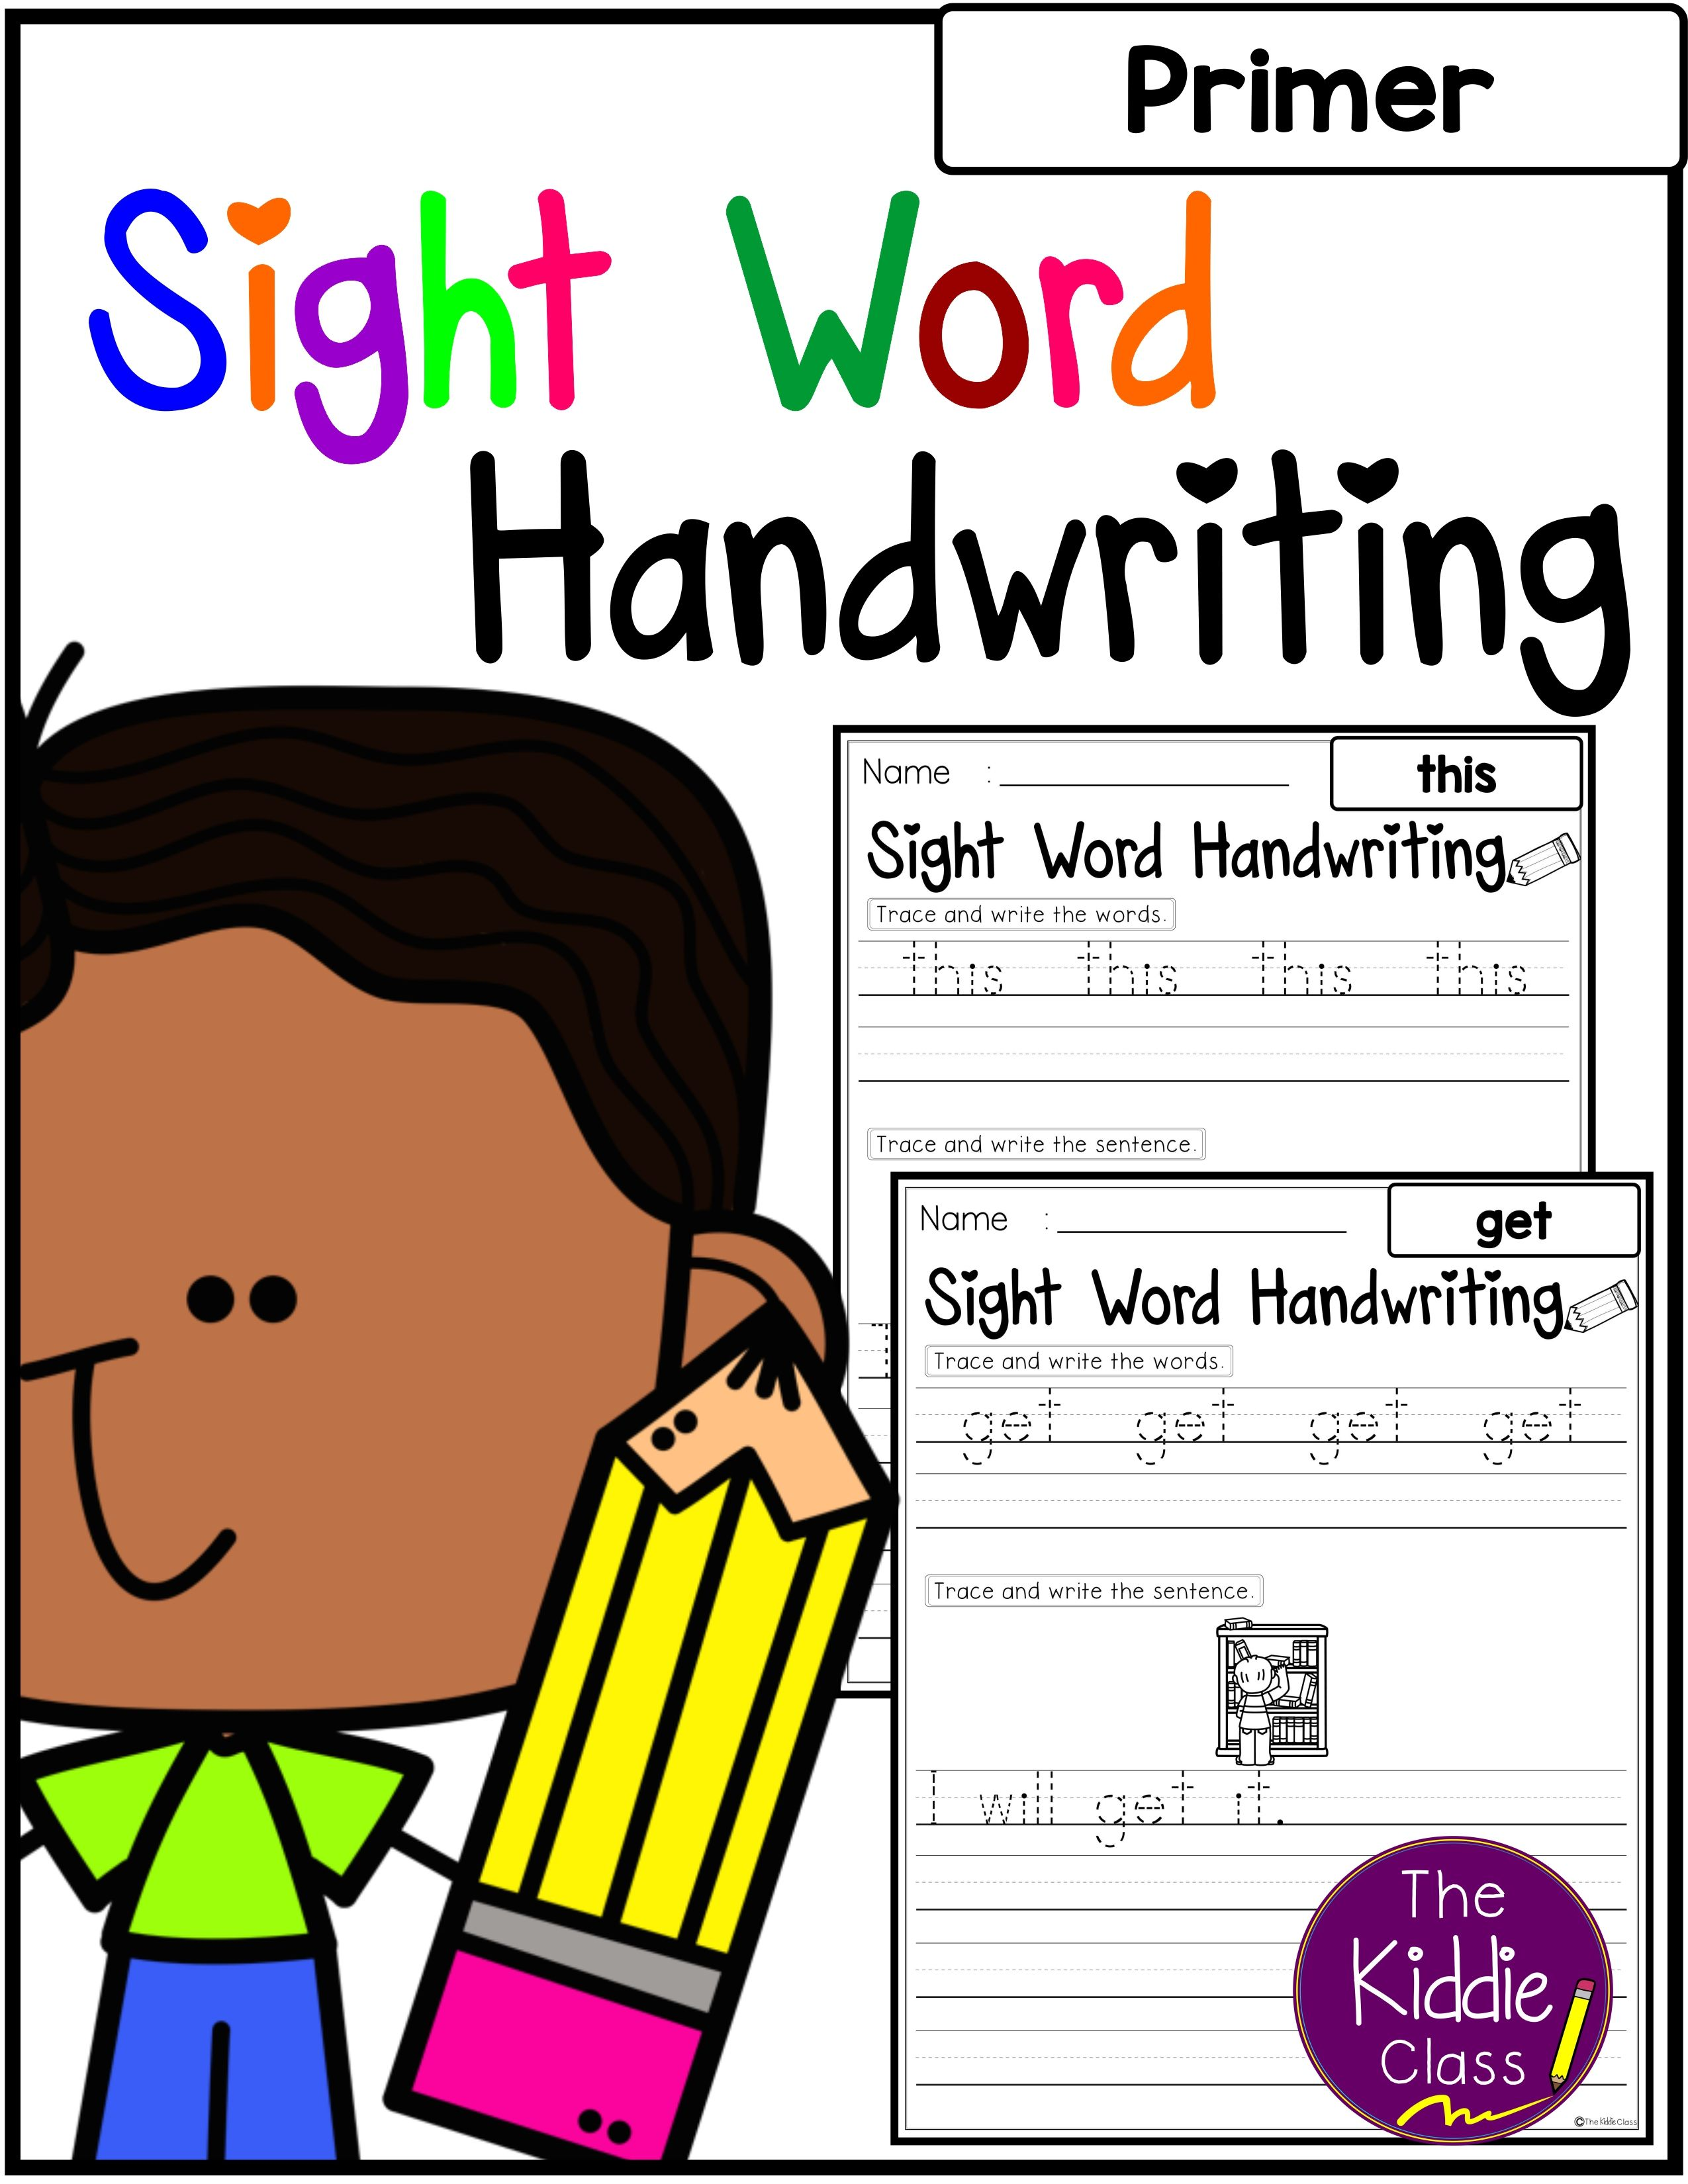 Sight Words Handwriting Primer